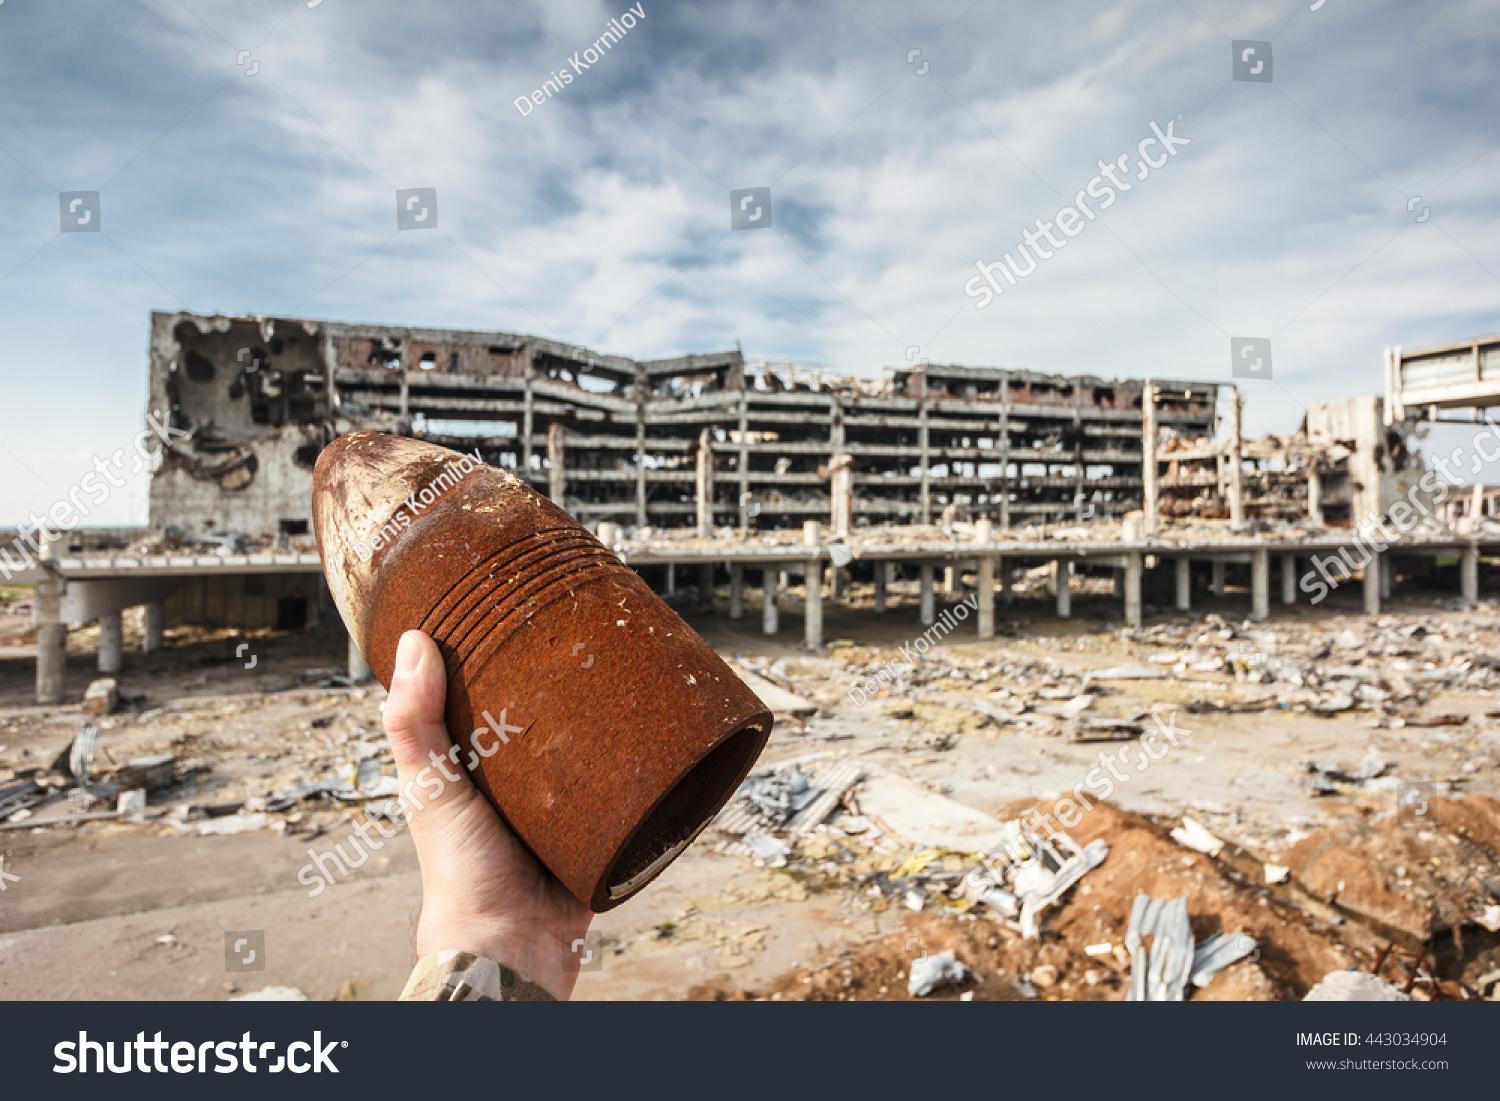 Mortar Shell Logo : Unexploded mm artillery shell hand stock photo